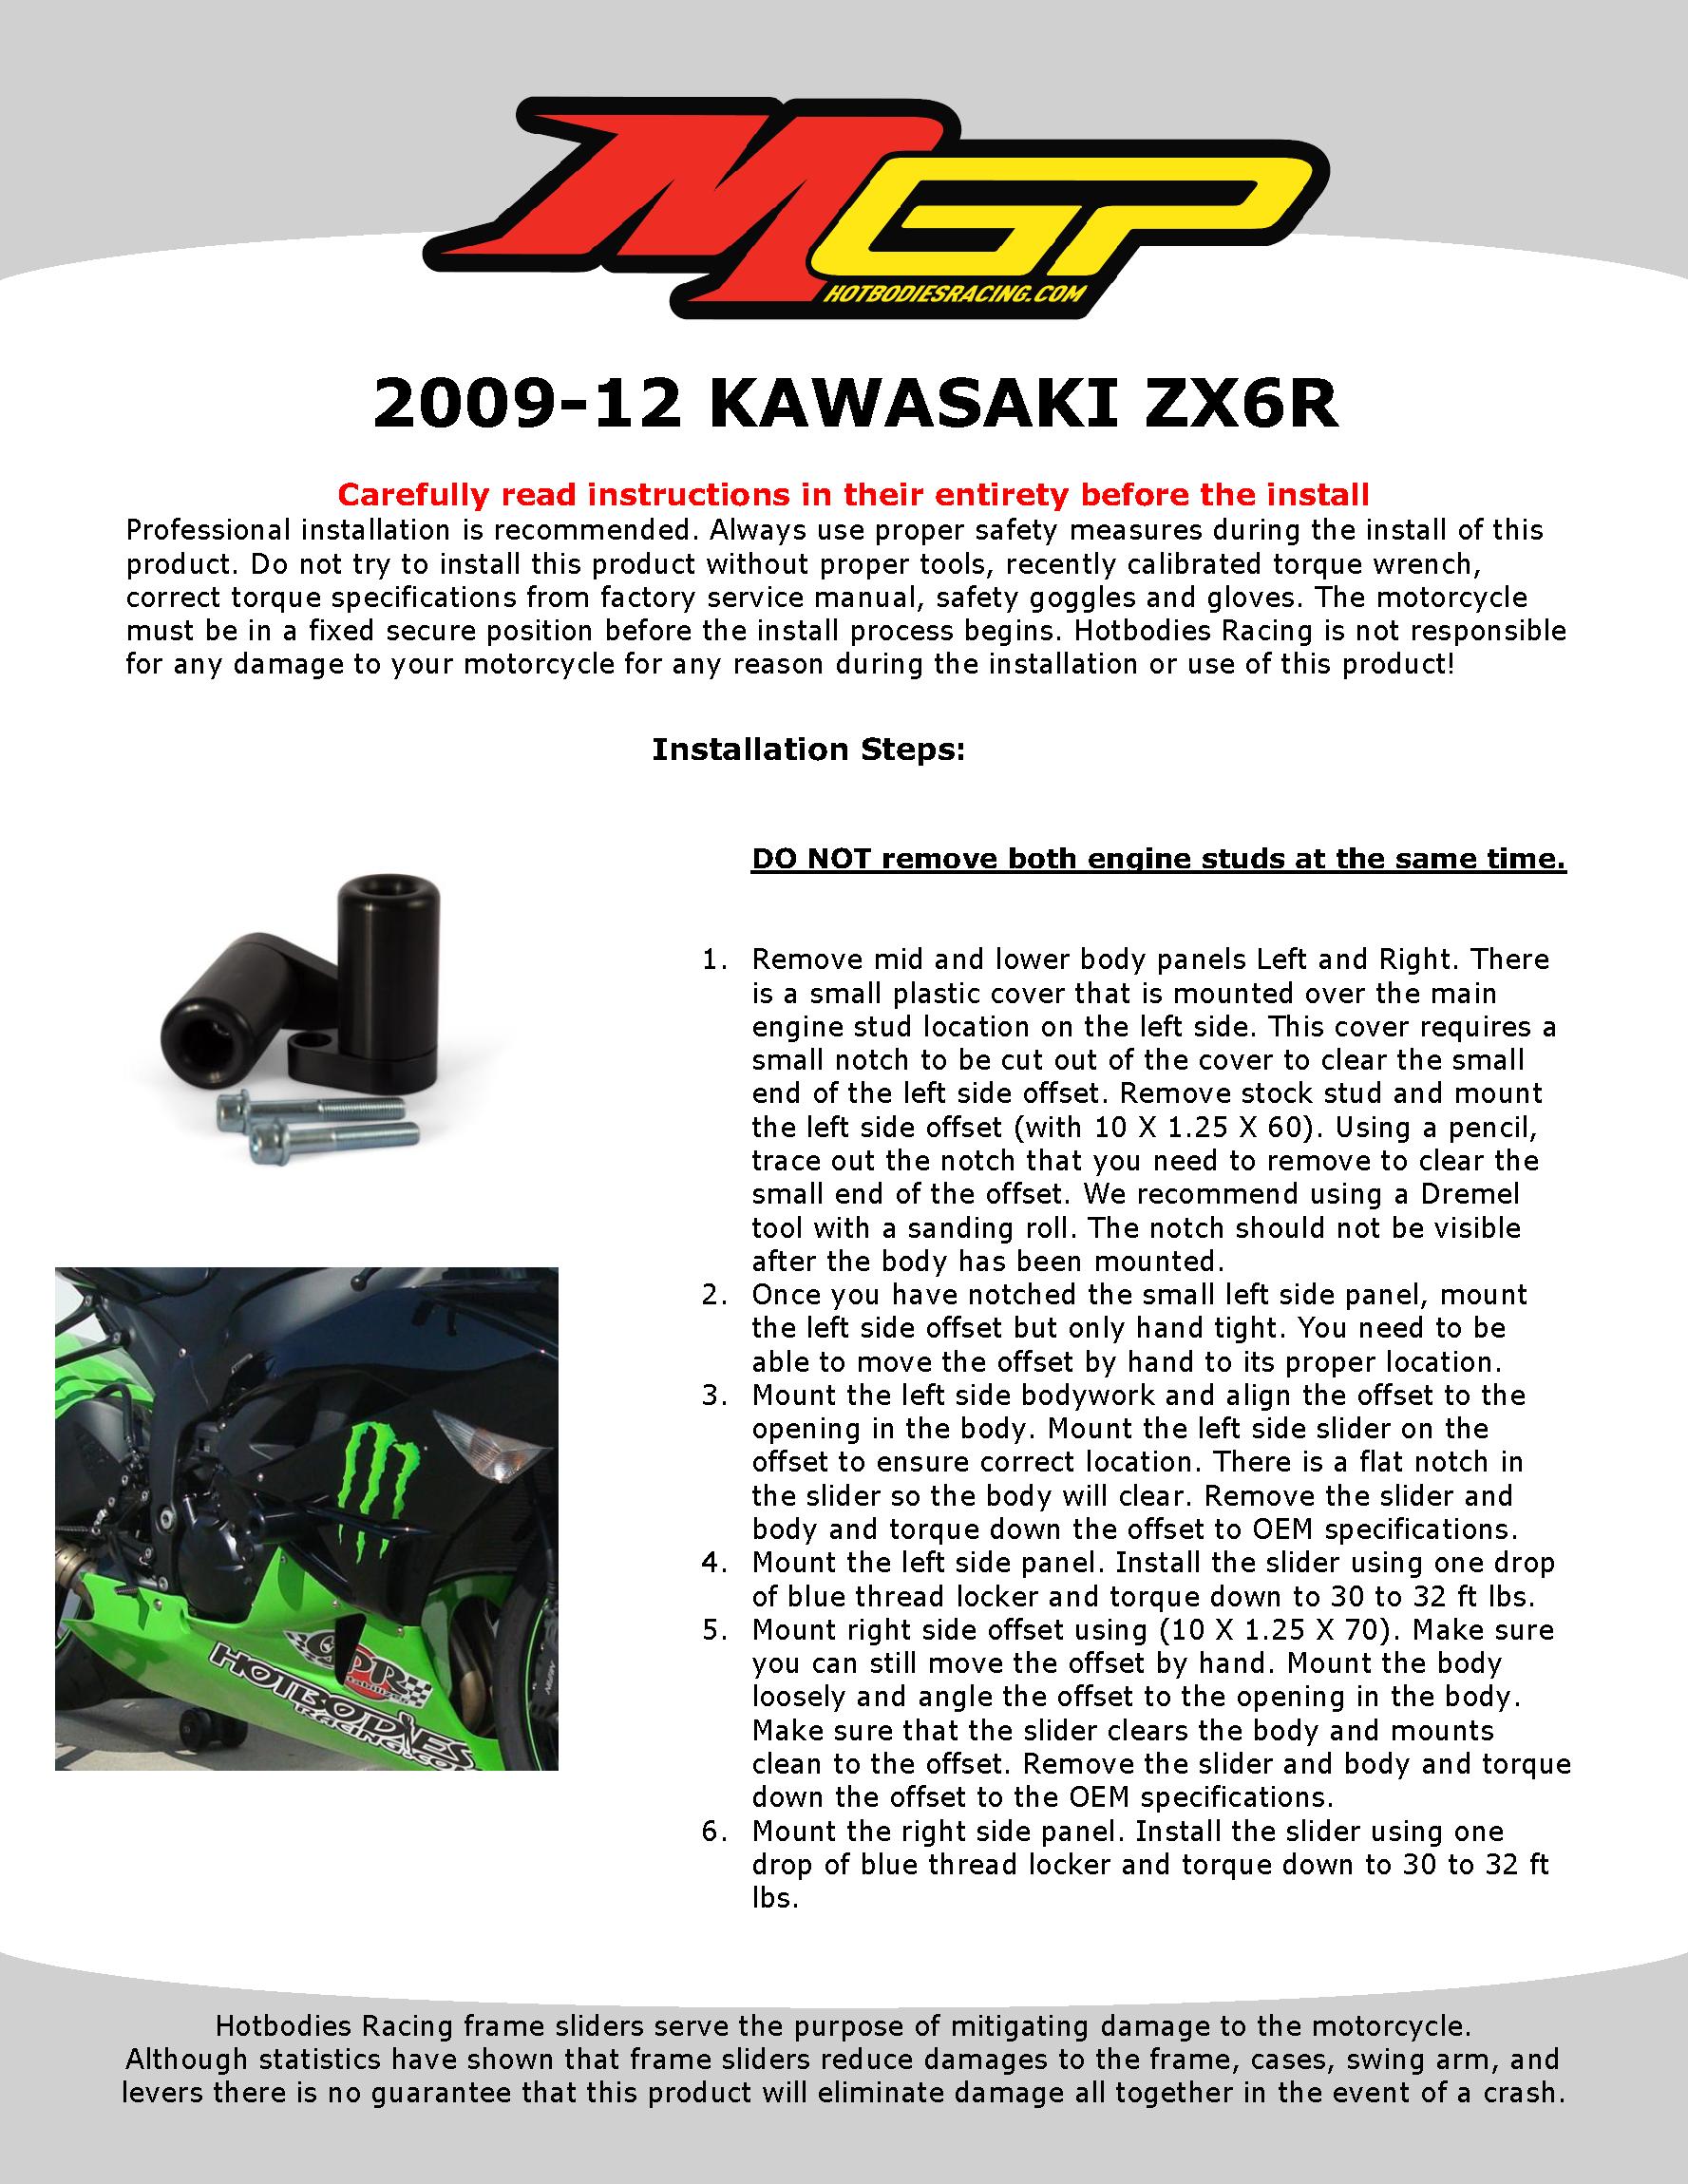 CBR F4i 2004-06 Undertail